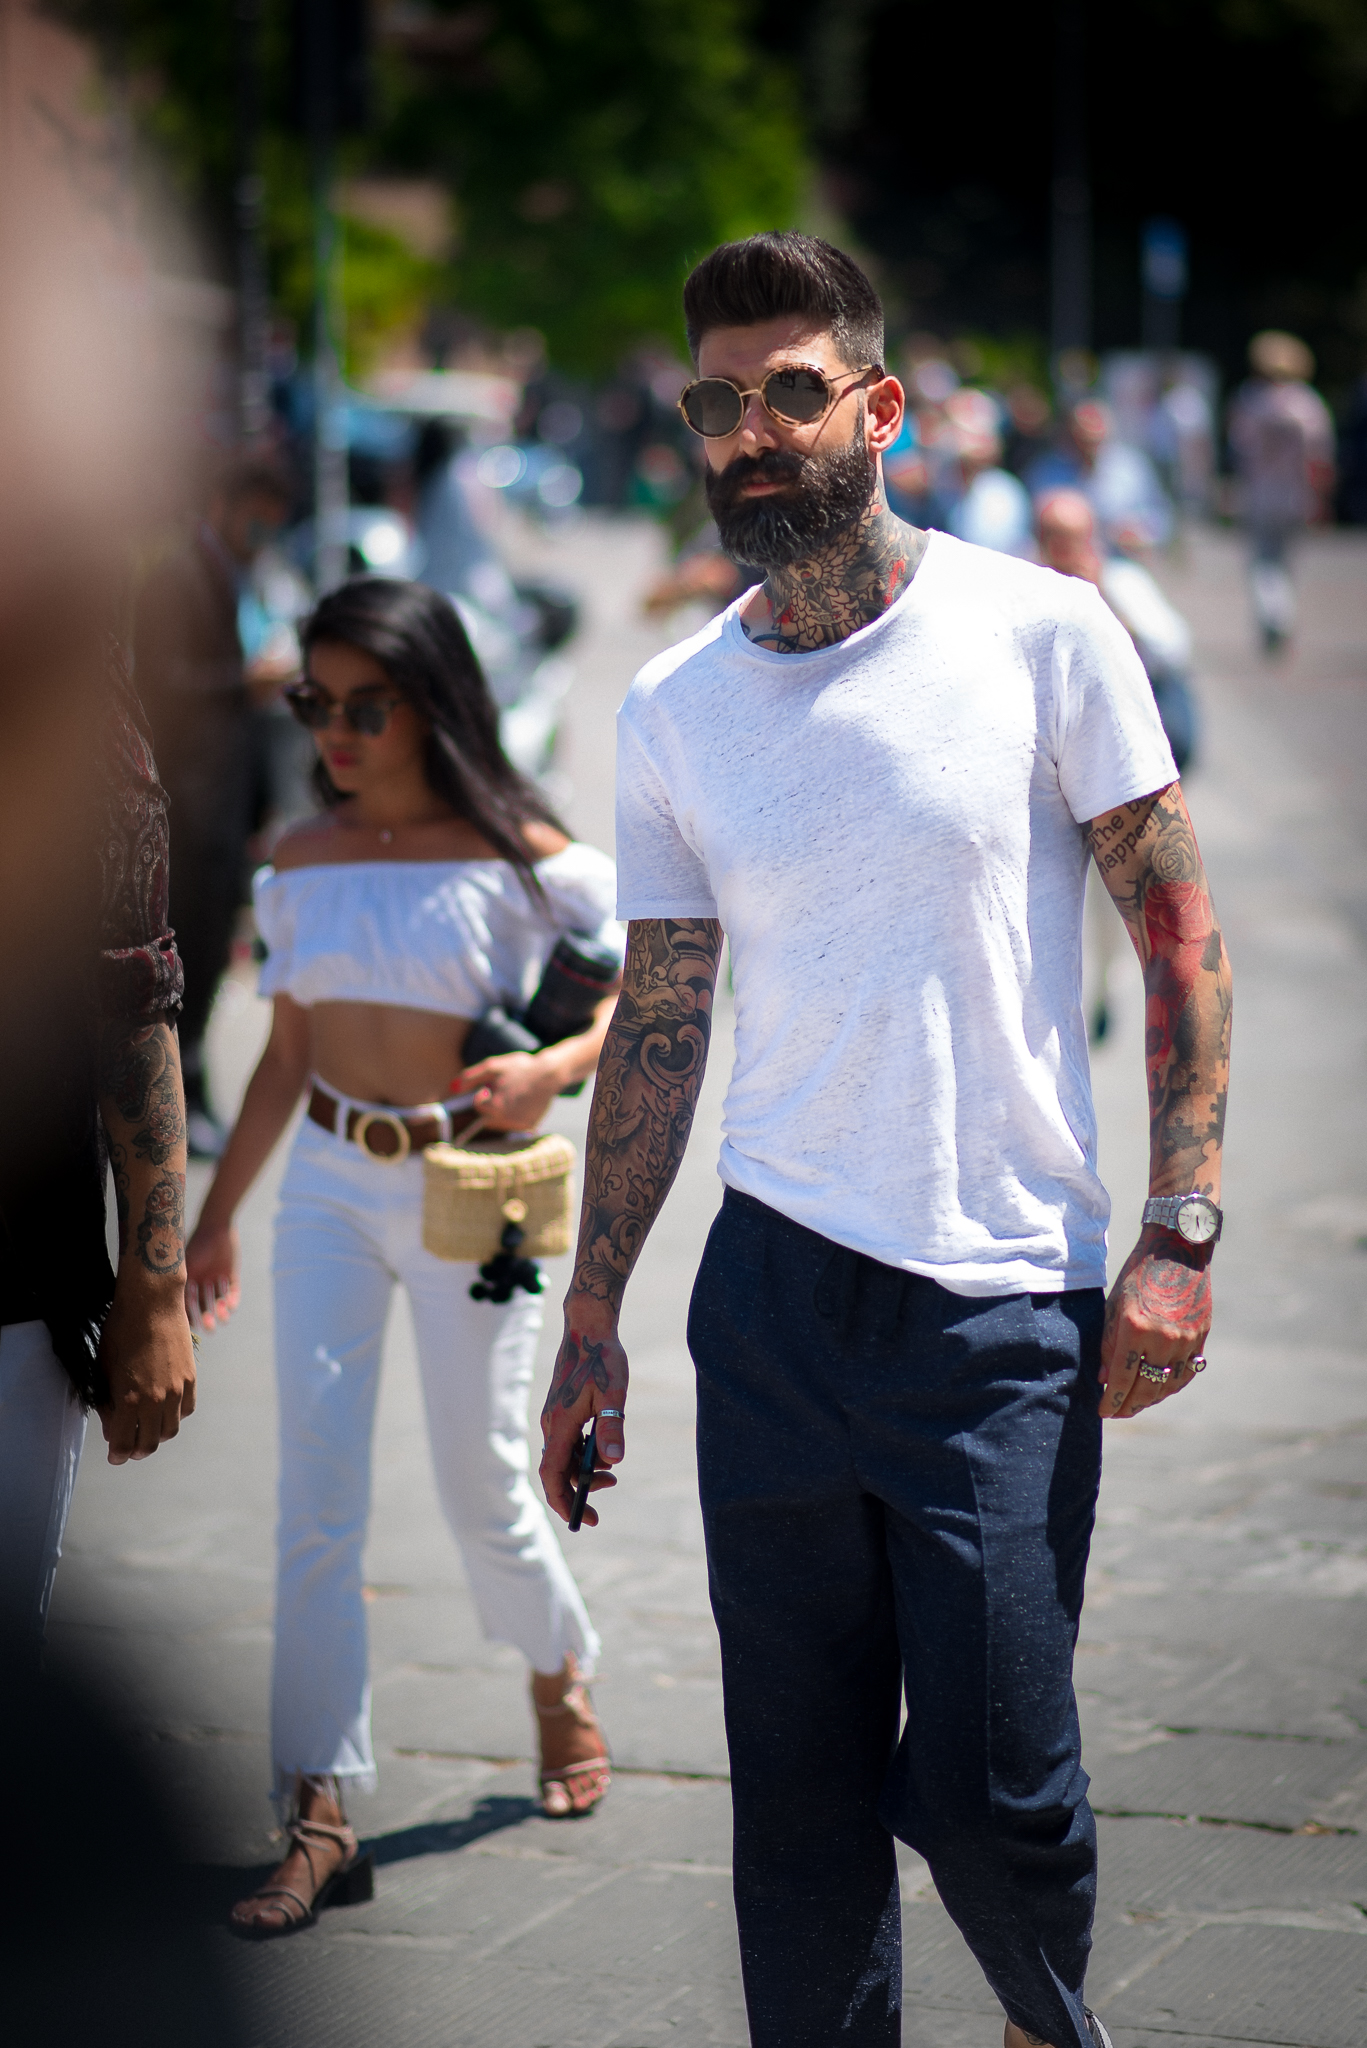 Carlos Costa_Street Style_Pitti Uomo_Firenze_Florence_13 June 2017_Photography Annika Lagerqvist_www.annikasomething.com